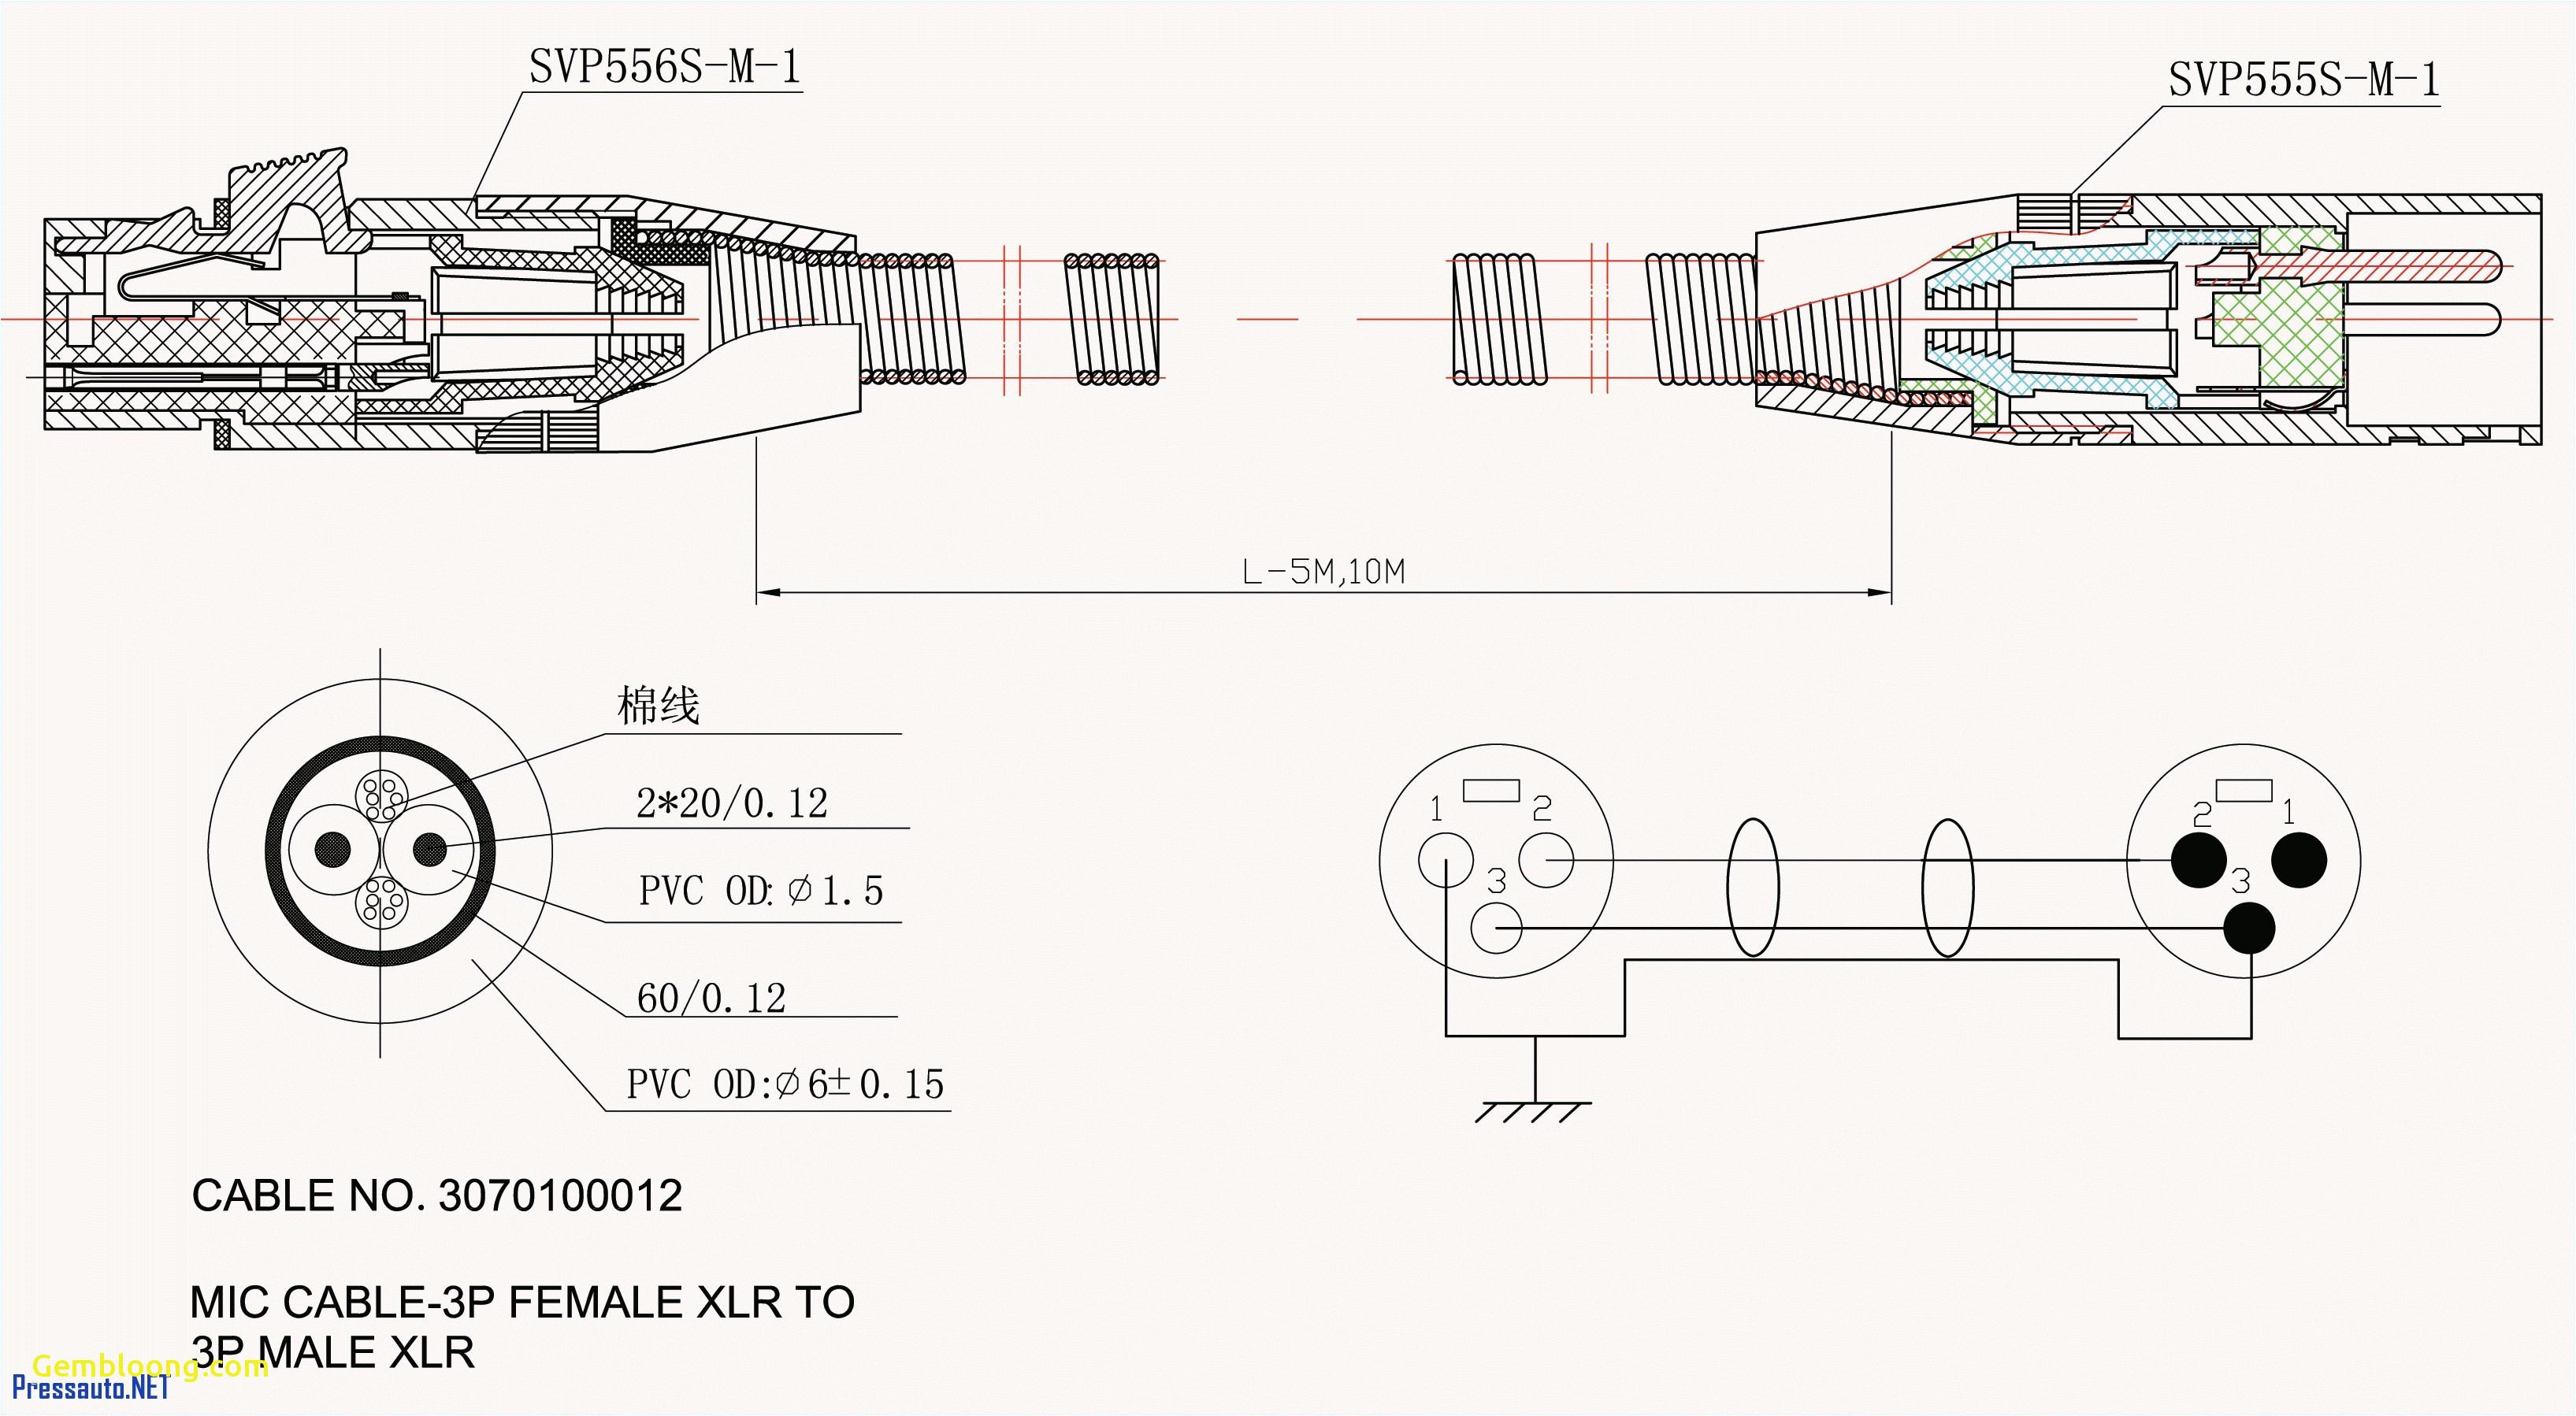 94 windstar wiring diagram wiring diagram centre ford aerostar engine diagram on 2000 ford ranger 3 0 heater hose